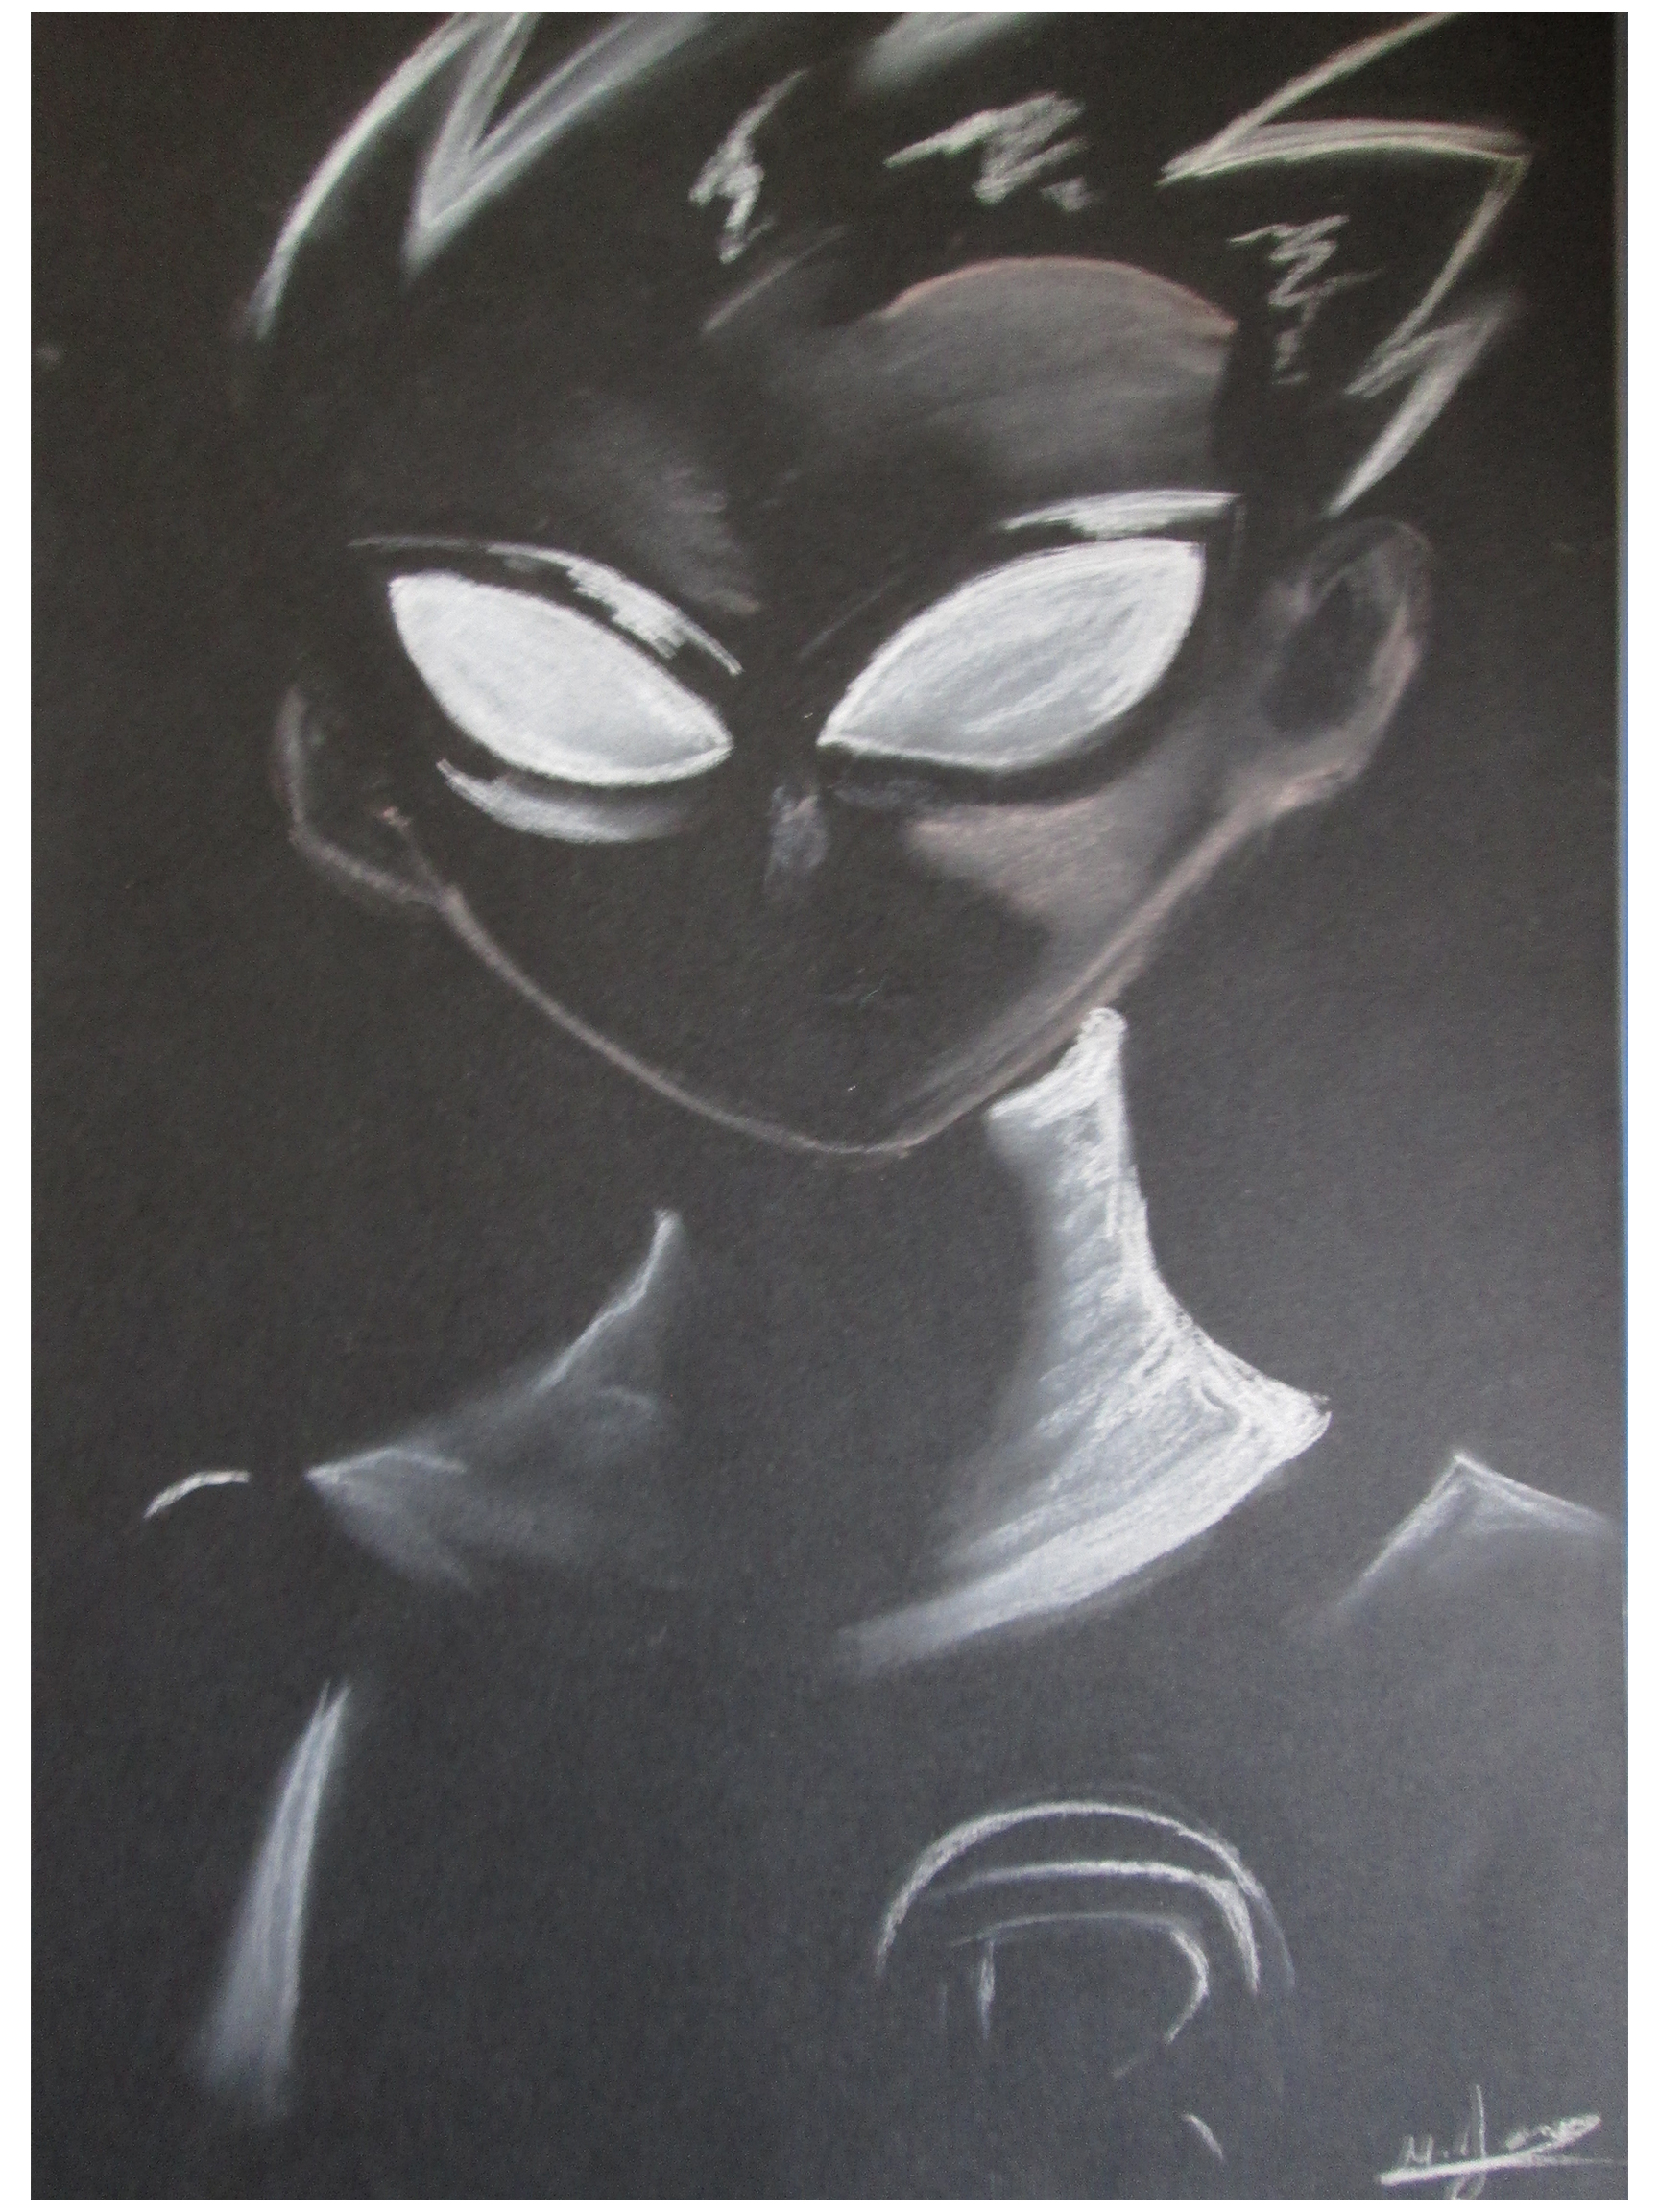 Robin (Grayson)